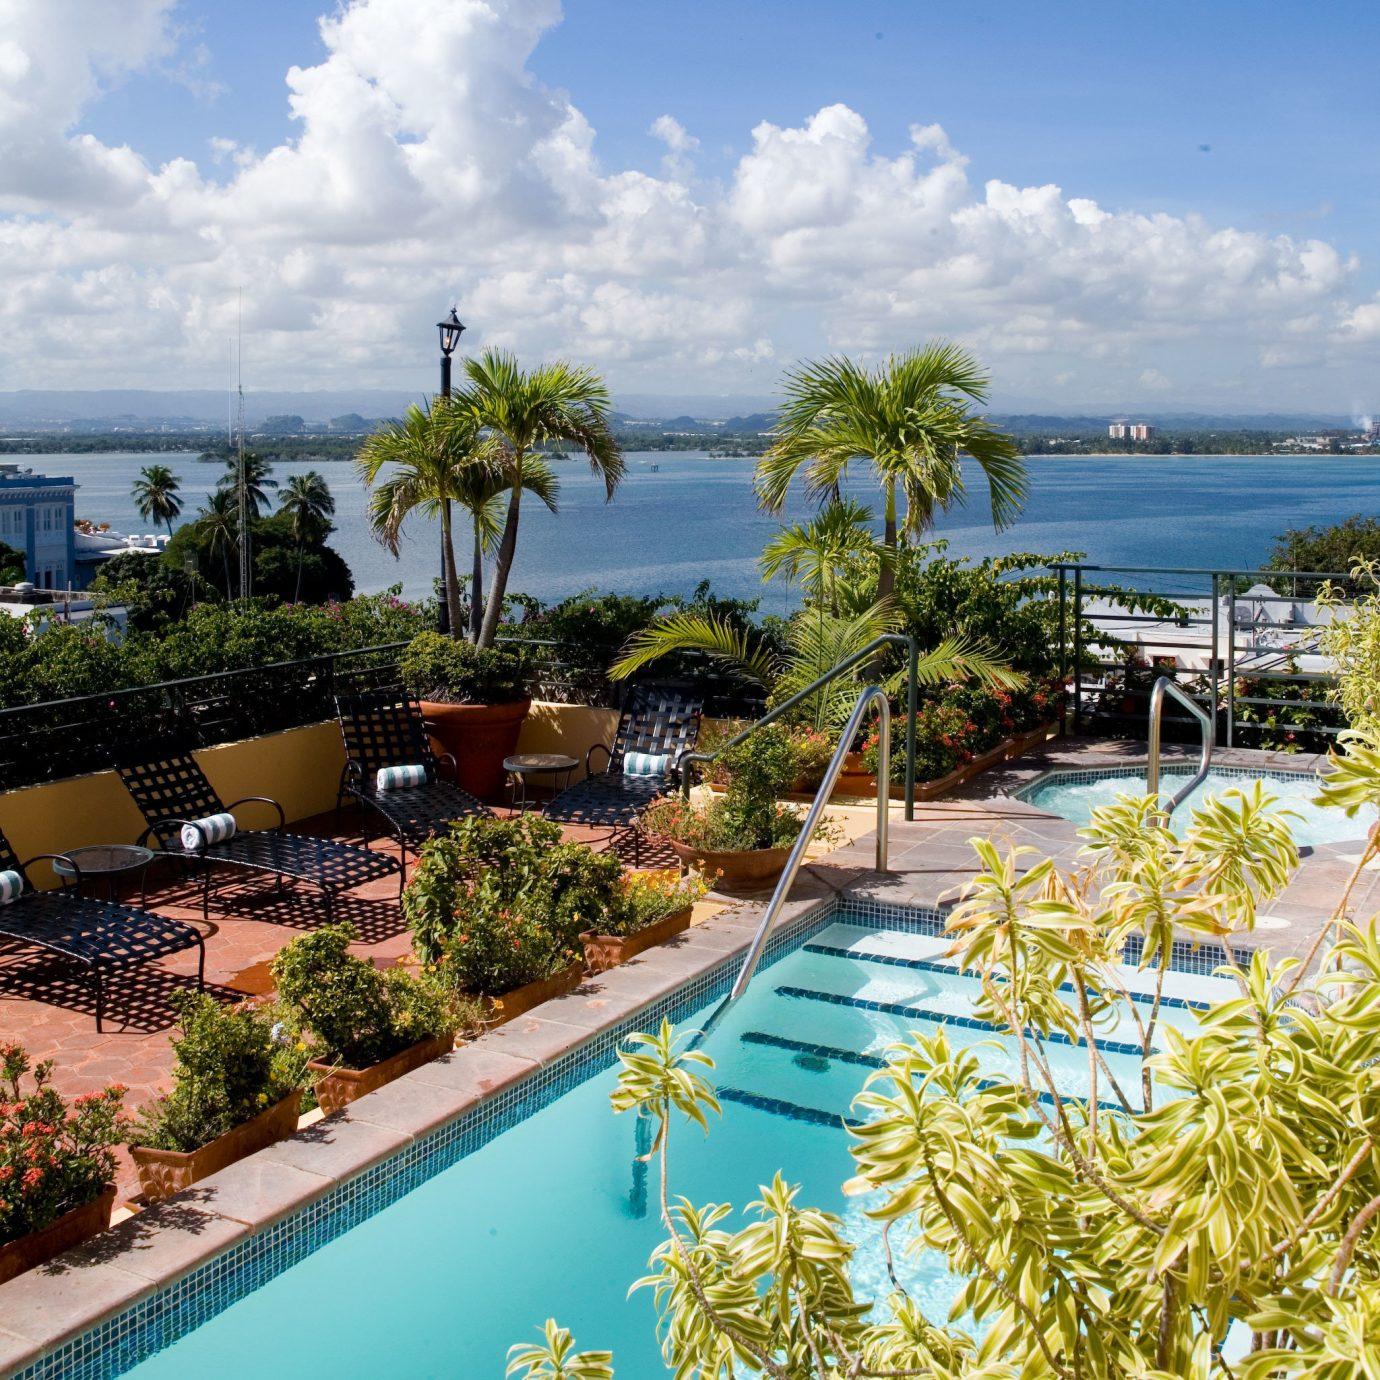 Fitness Hotels Pool Sport Wellness sky water tree swimming pool property Resort caribbean Nature Sea Ocean arecales Beach condominium Coast Lagoon Villa tropics overlooking shore